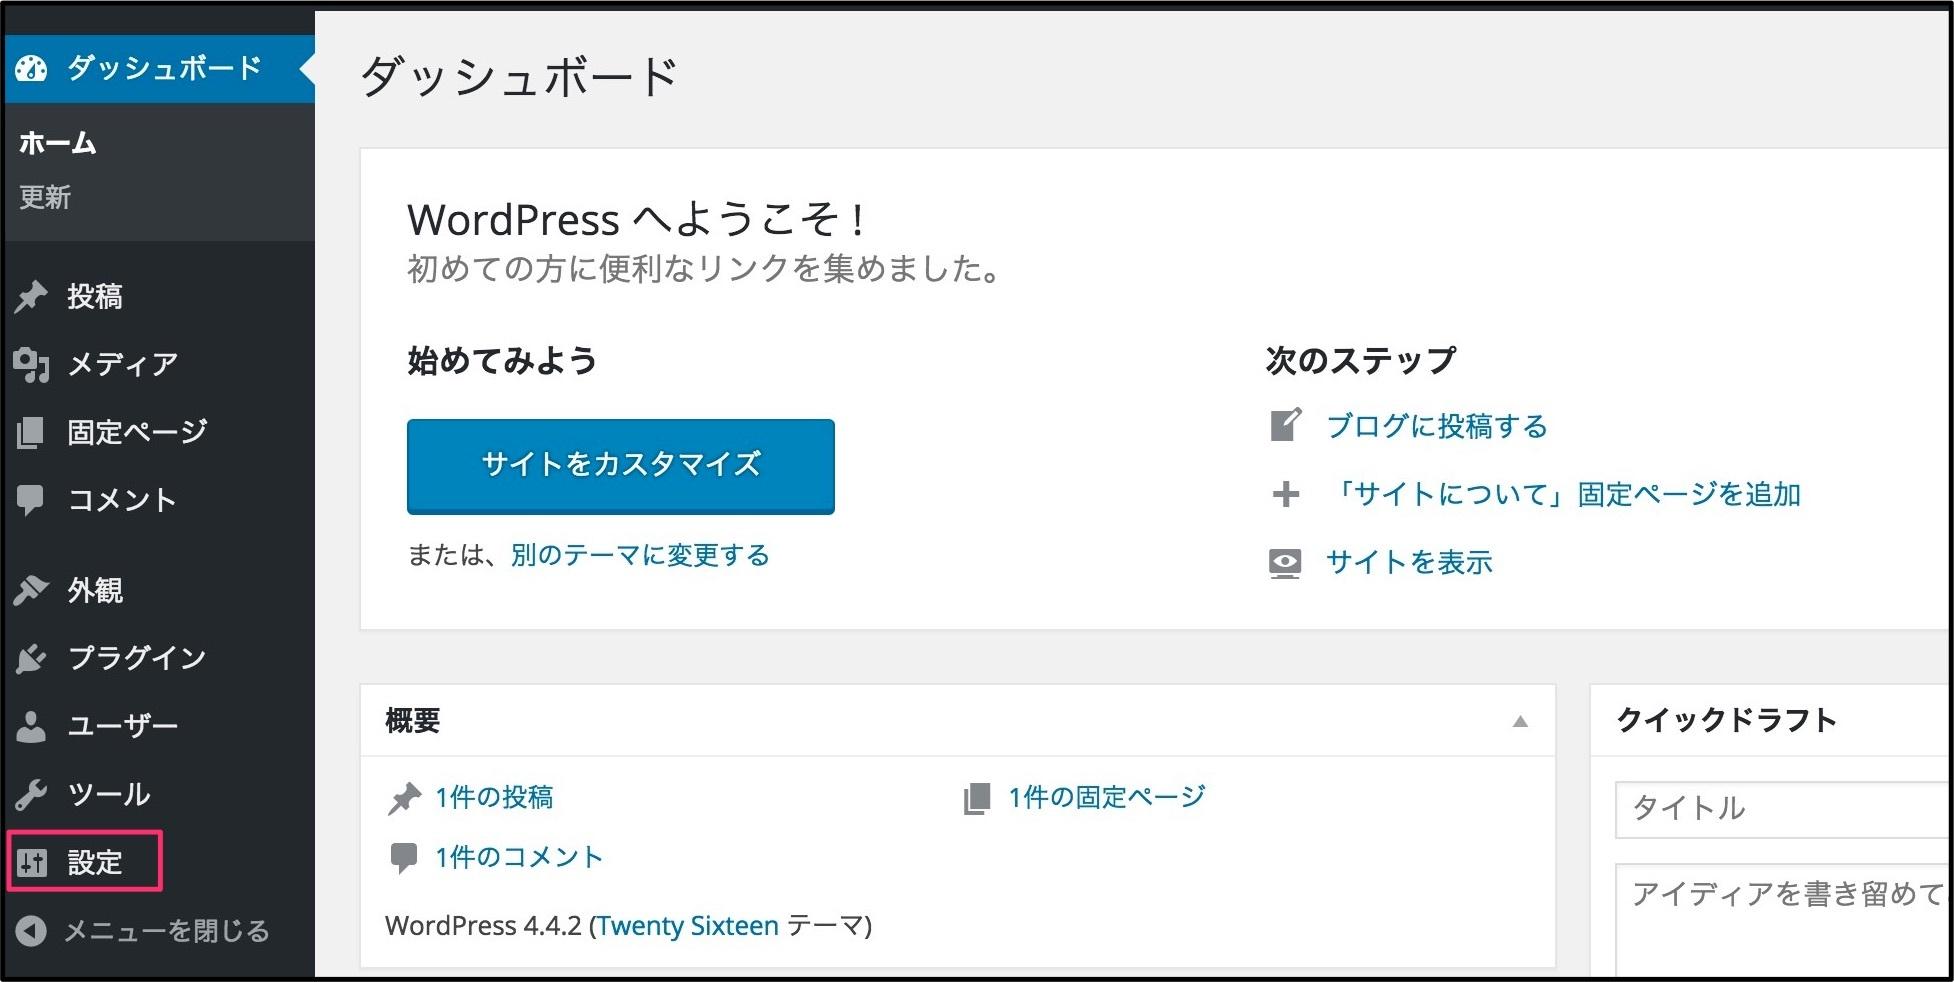 Wordpressサイトタイトル決め方